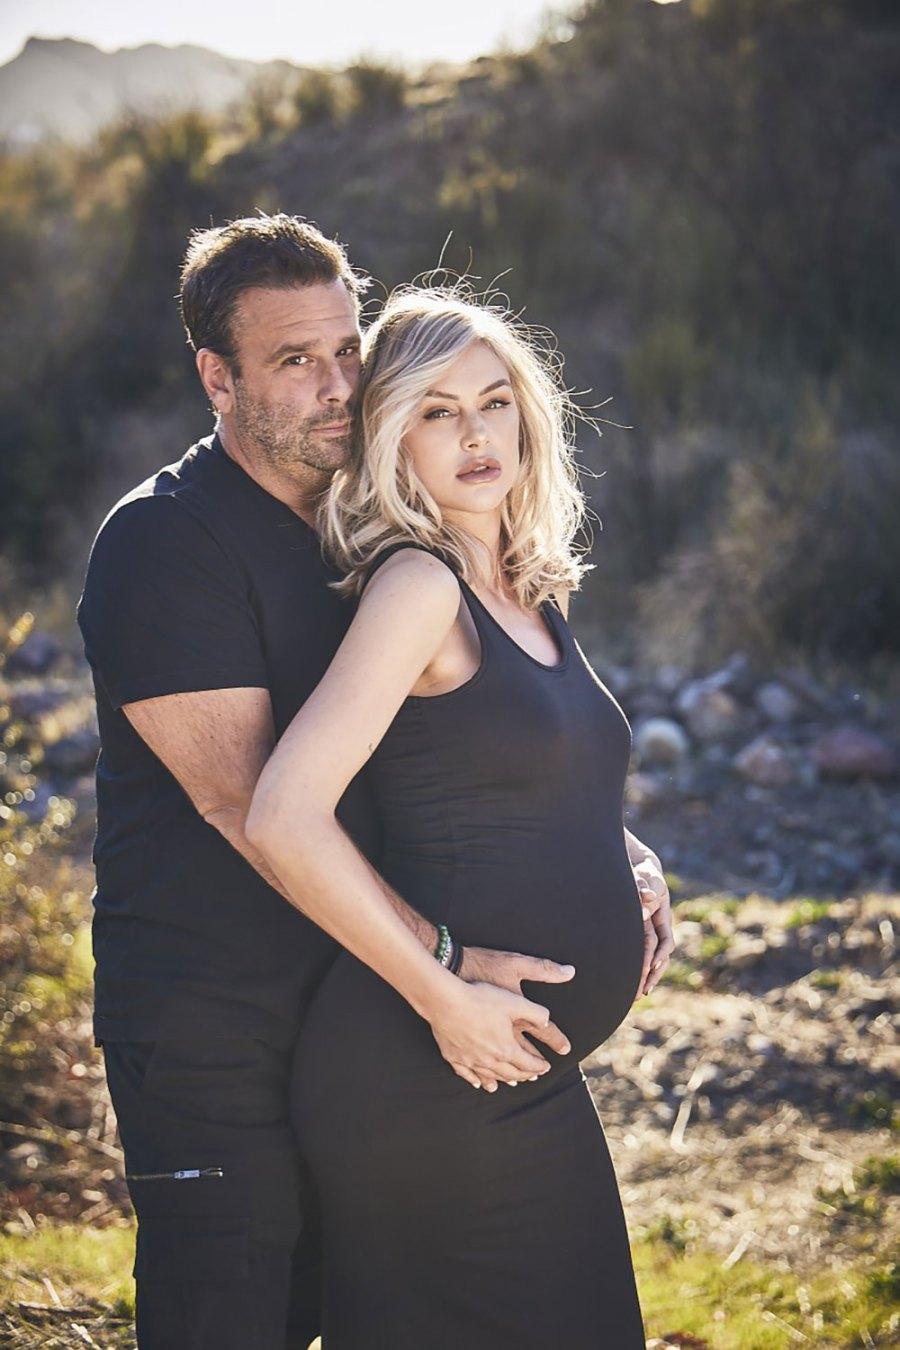 Vanderpump Rules Star Lala Kent Bares Baby Bump In Nude